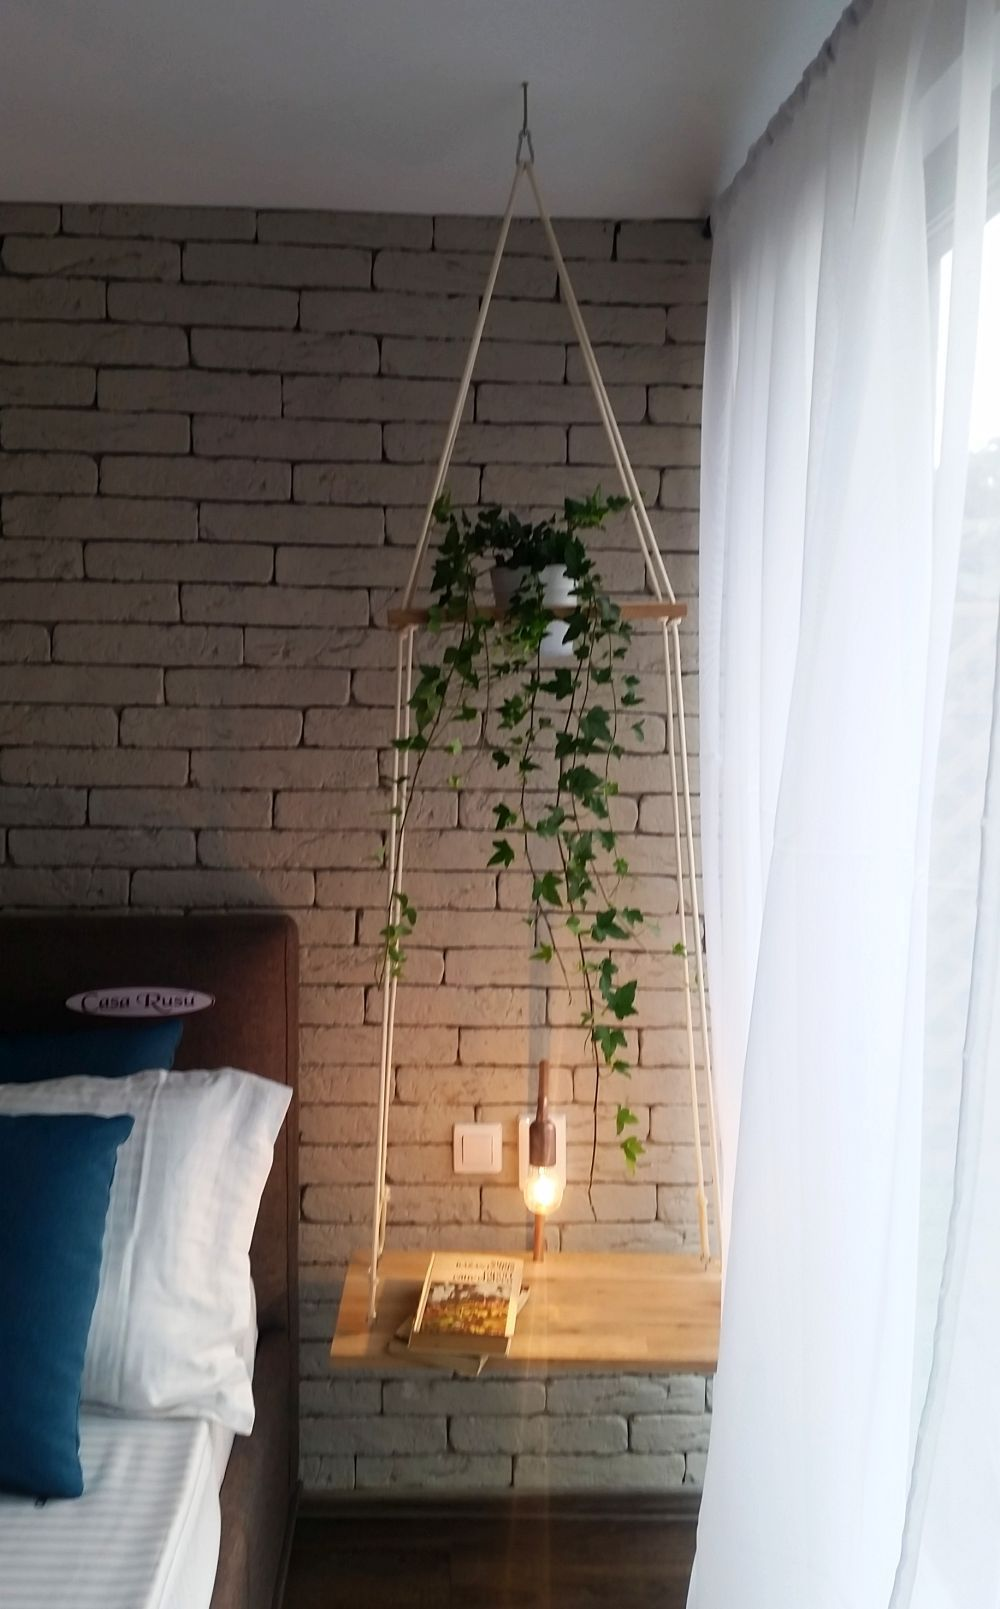 Hanging shelves, hanging nightstand idea | Decoration ideas ...